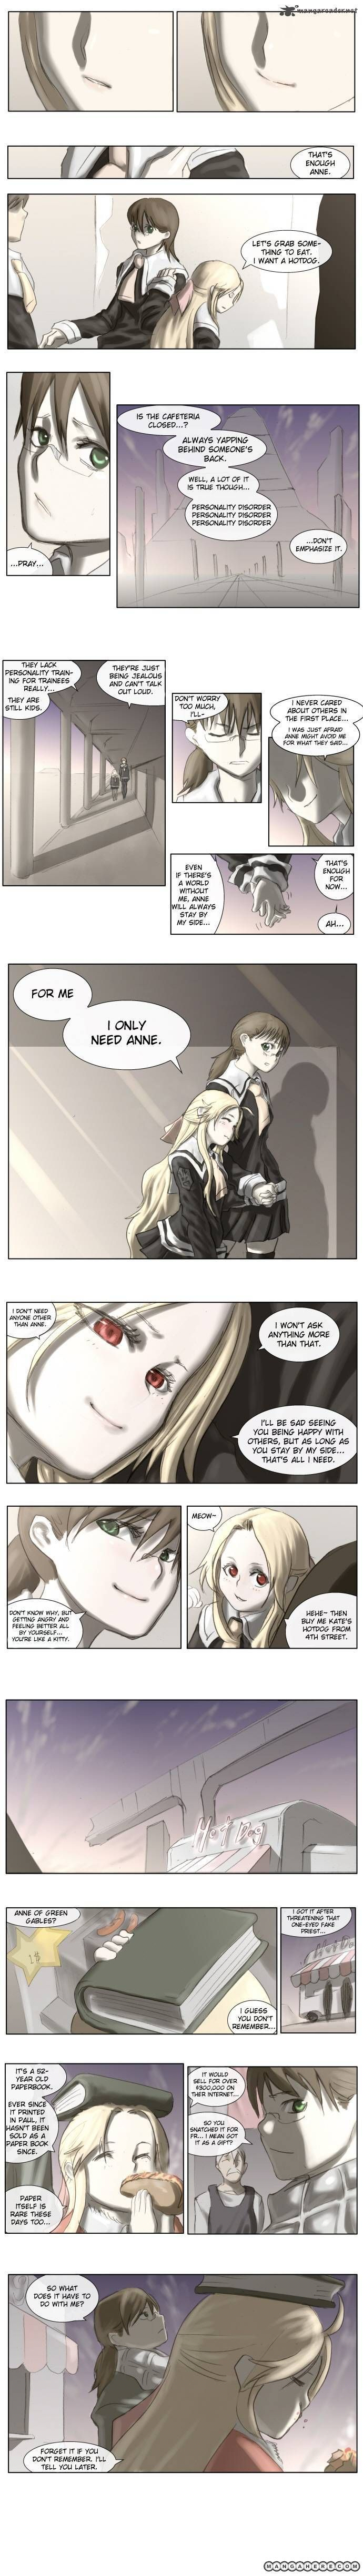 Knight Run 26 Page 3